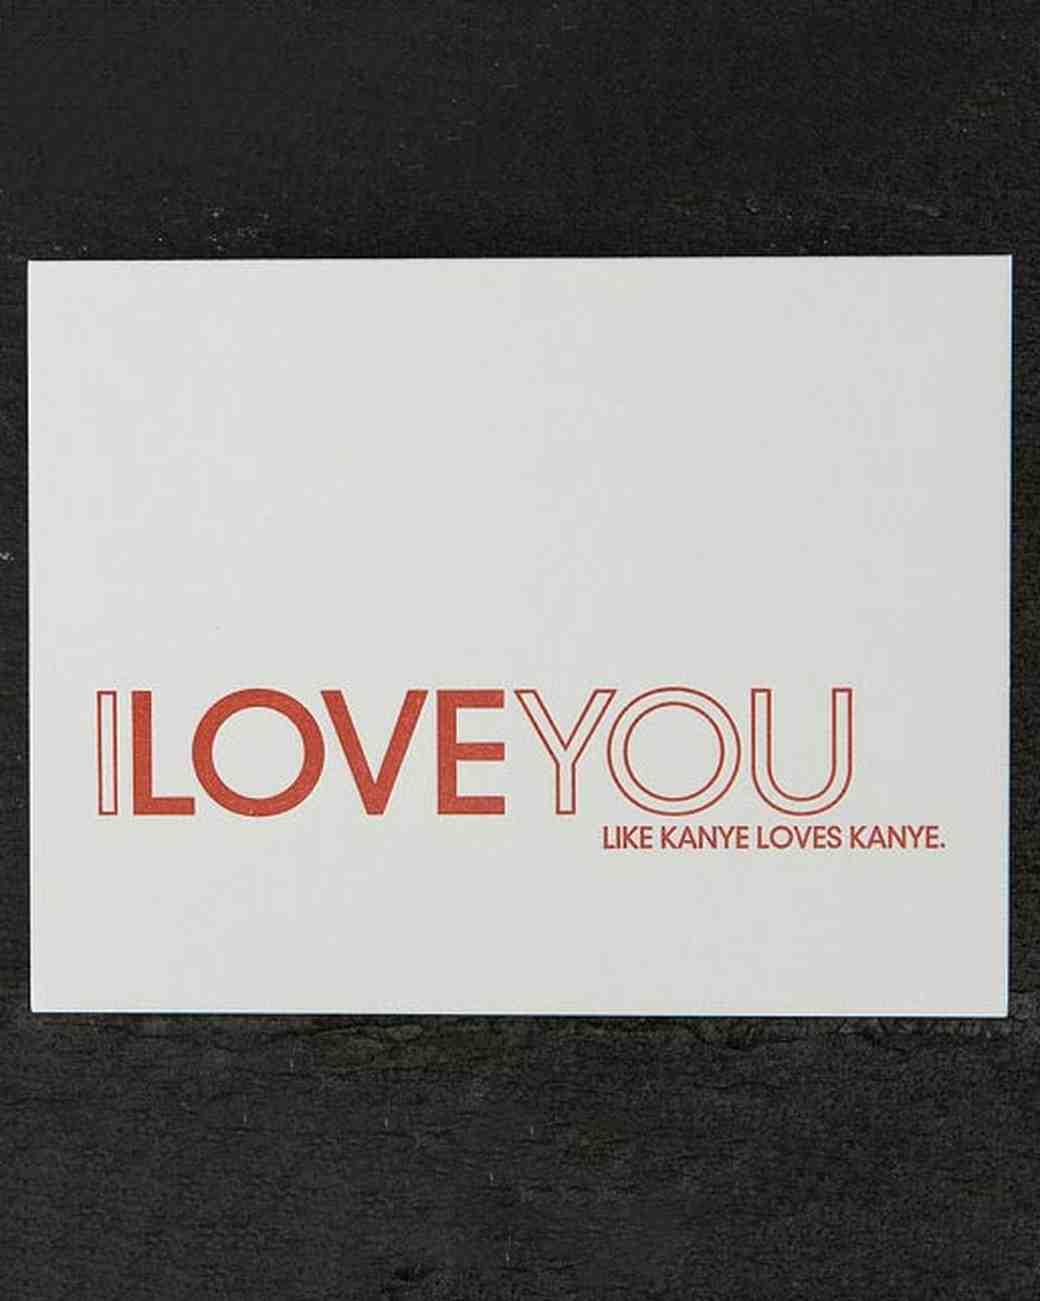 vday-cards-we-love-sapling-press-love-you-like-kim-loves-kanye-0216.jpg